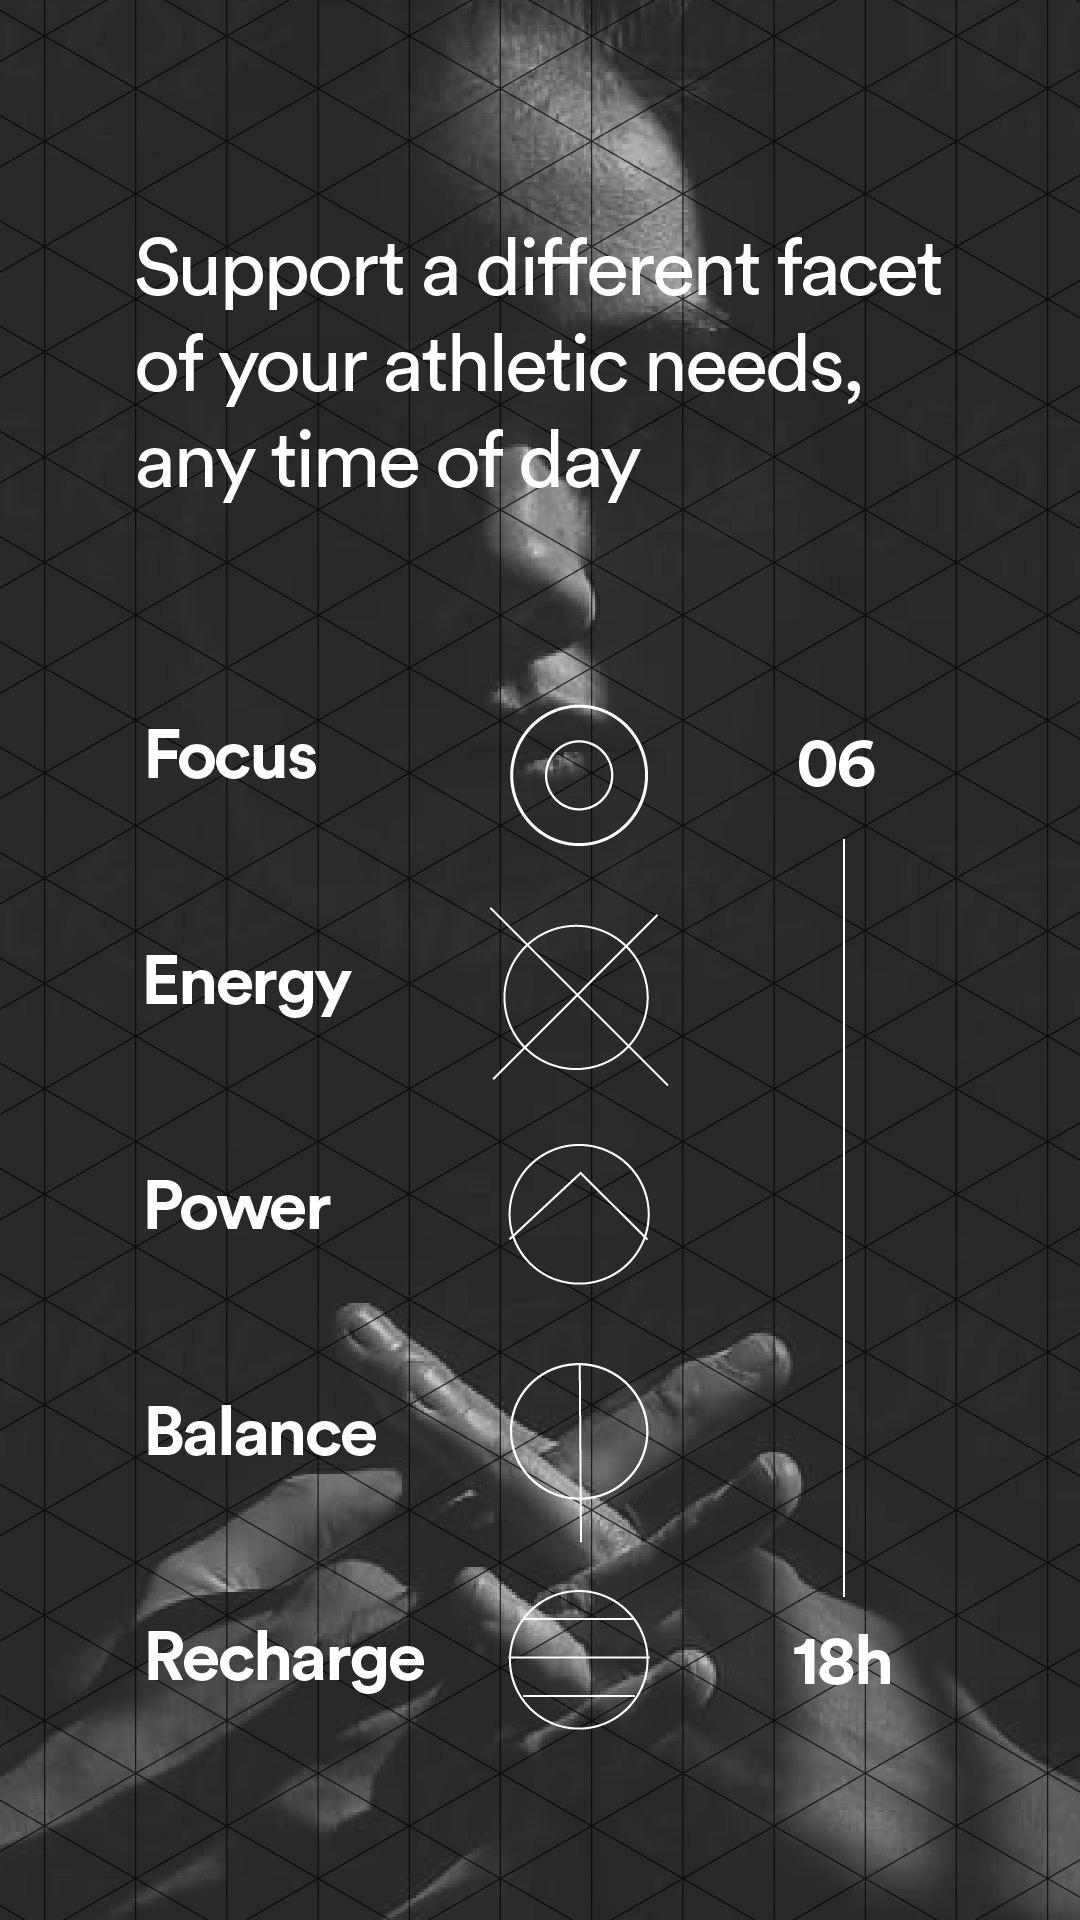 foodlab-support-schedule